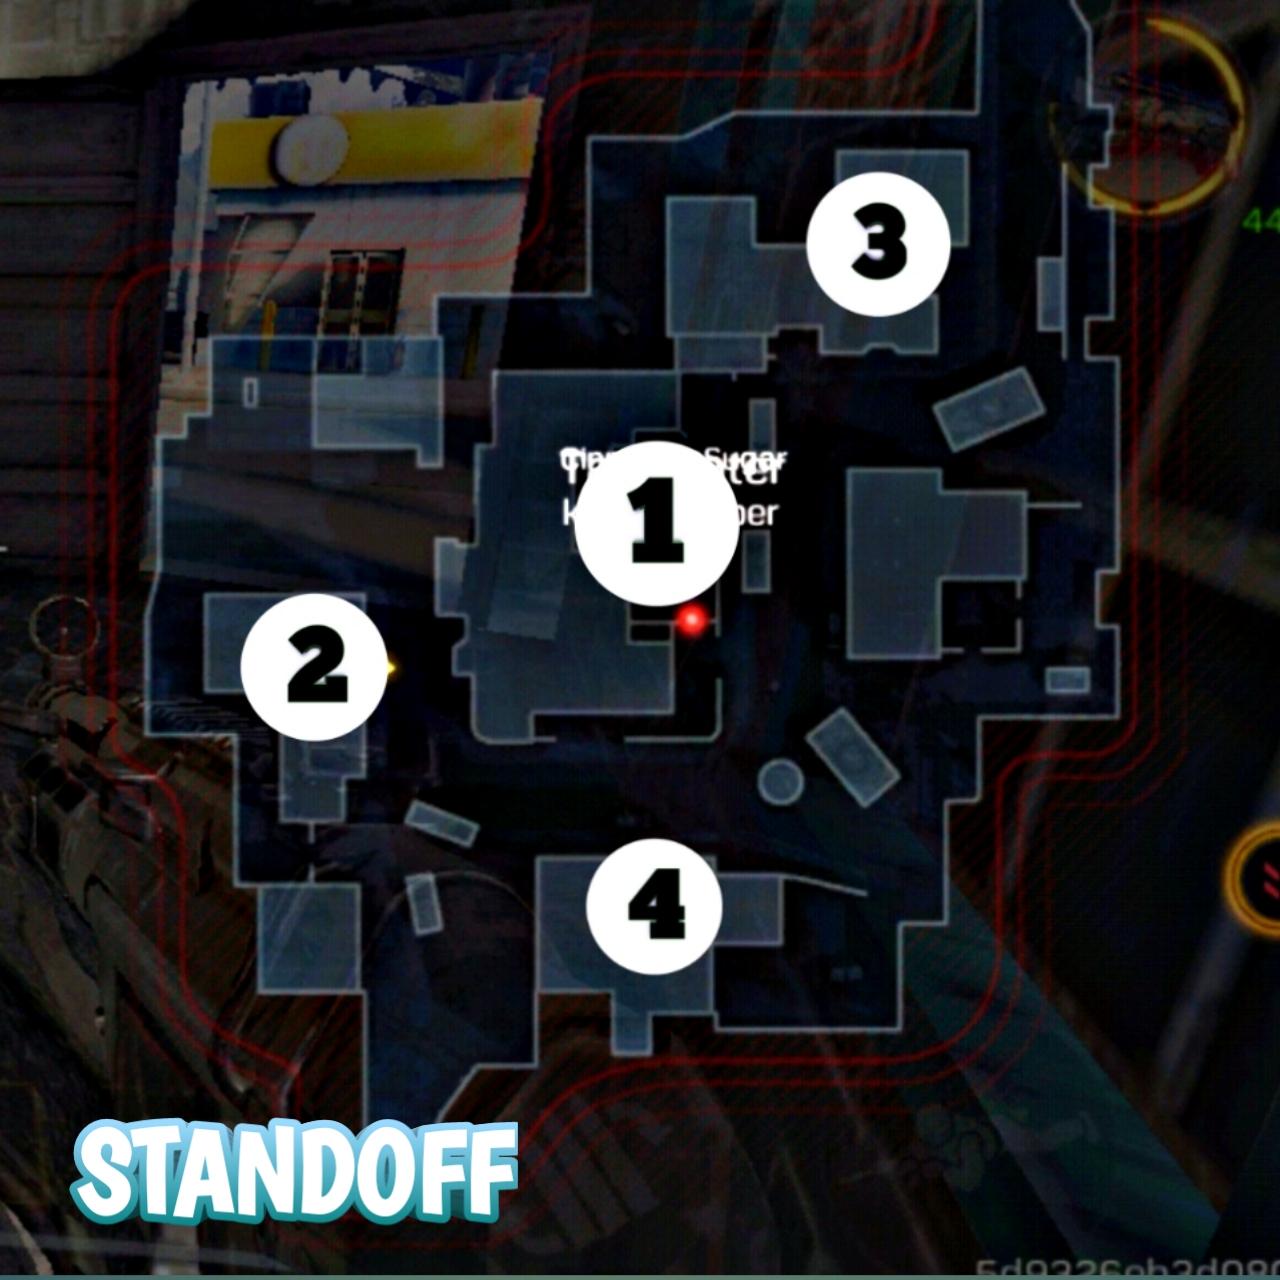 Standoff Hardpoint location